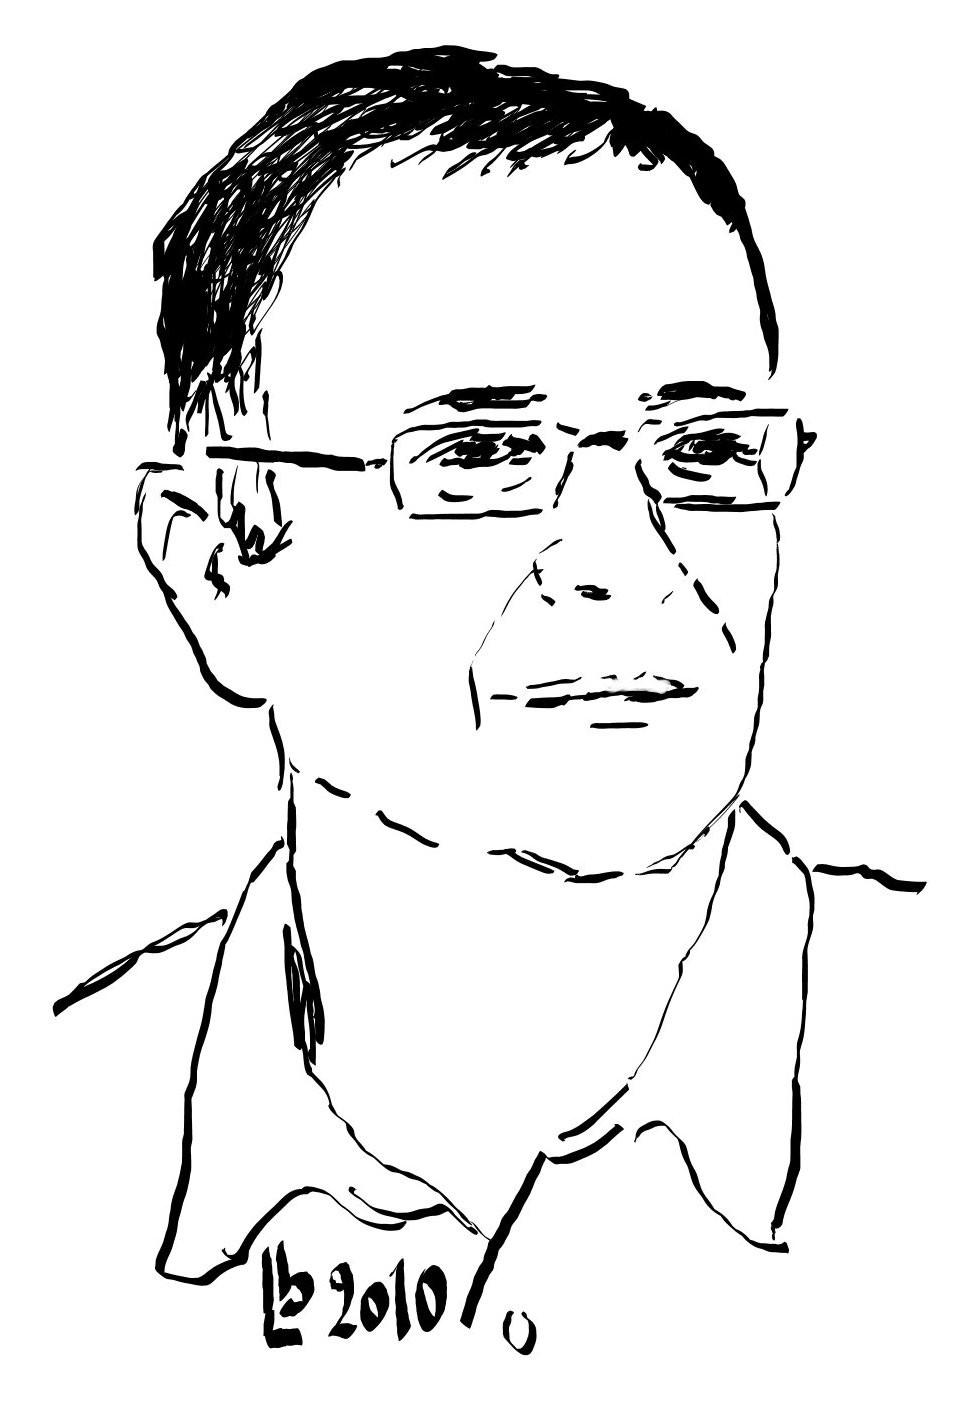 Benoît Lesne